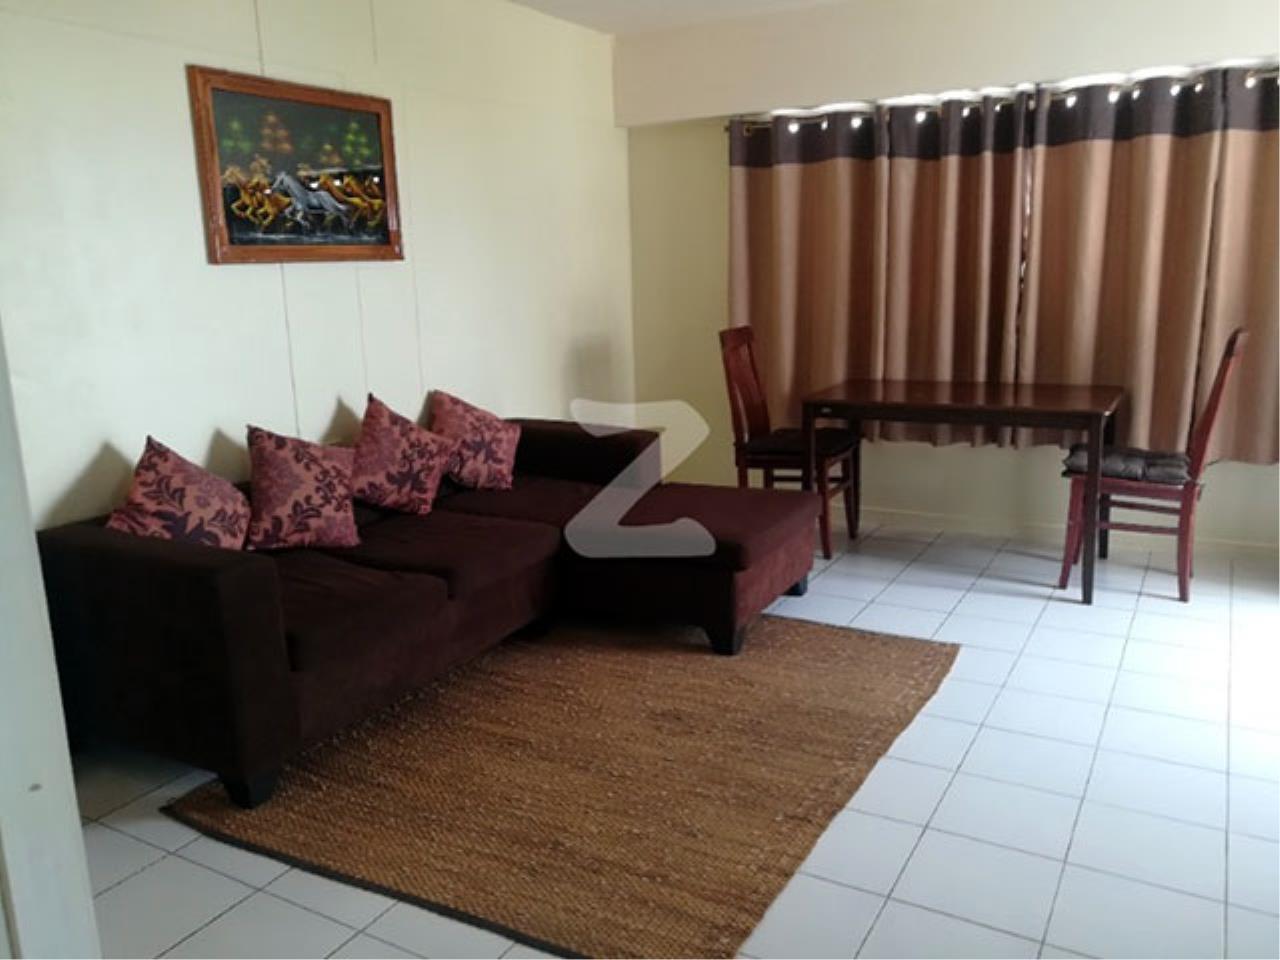 Agent - Sarunya jantanakorn Agency's BE0034 Condo for Sale Lumpini Center Happyland fl.6th 43 sqm 1 bed near The Mall Bangkapi 4